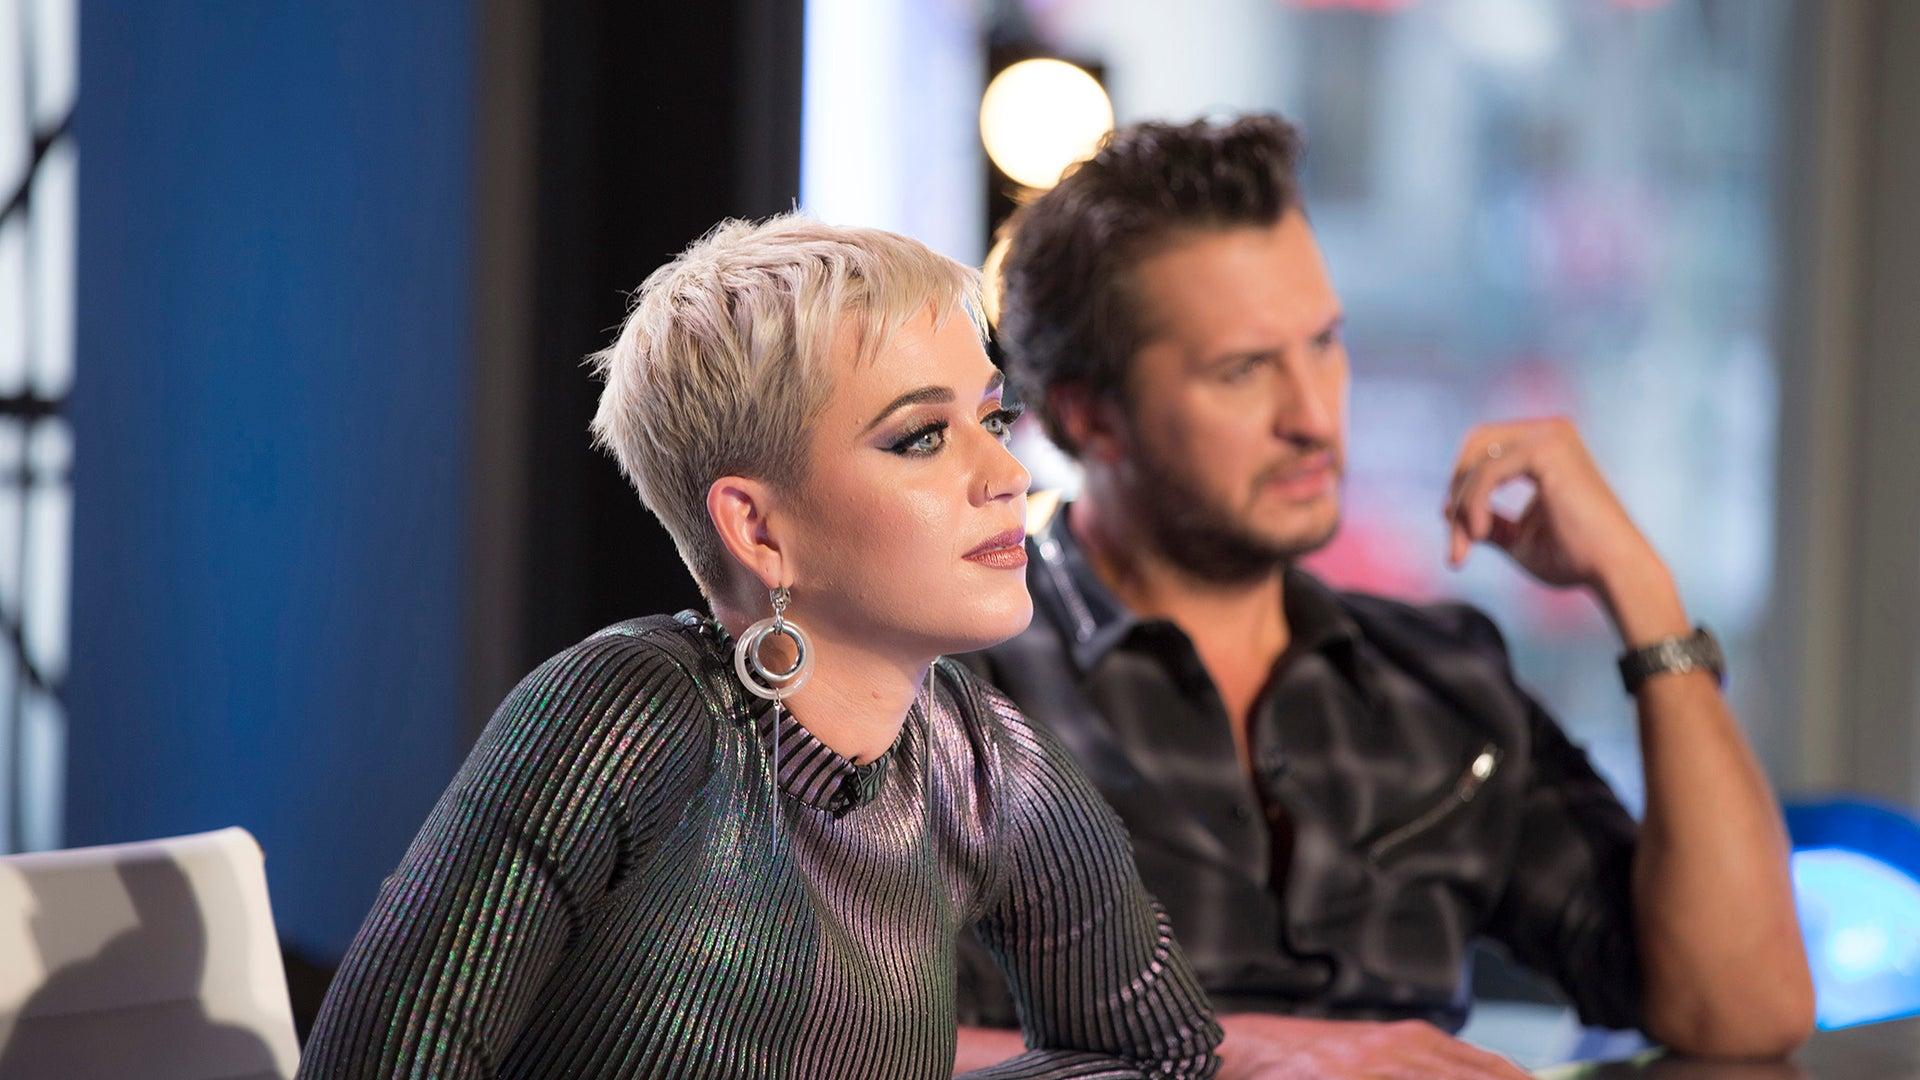 Katy Perry and Luke Bryan, American Idol